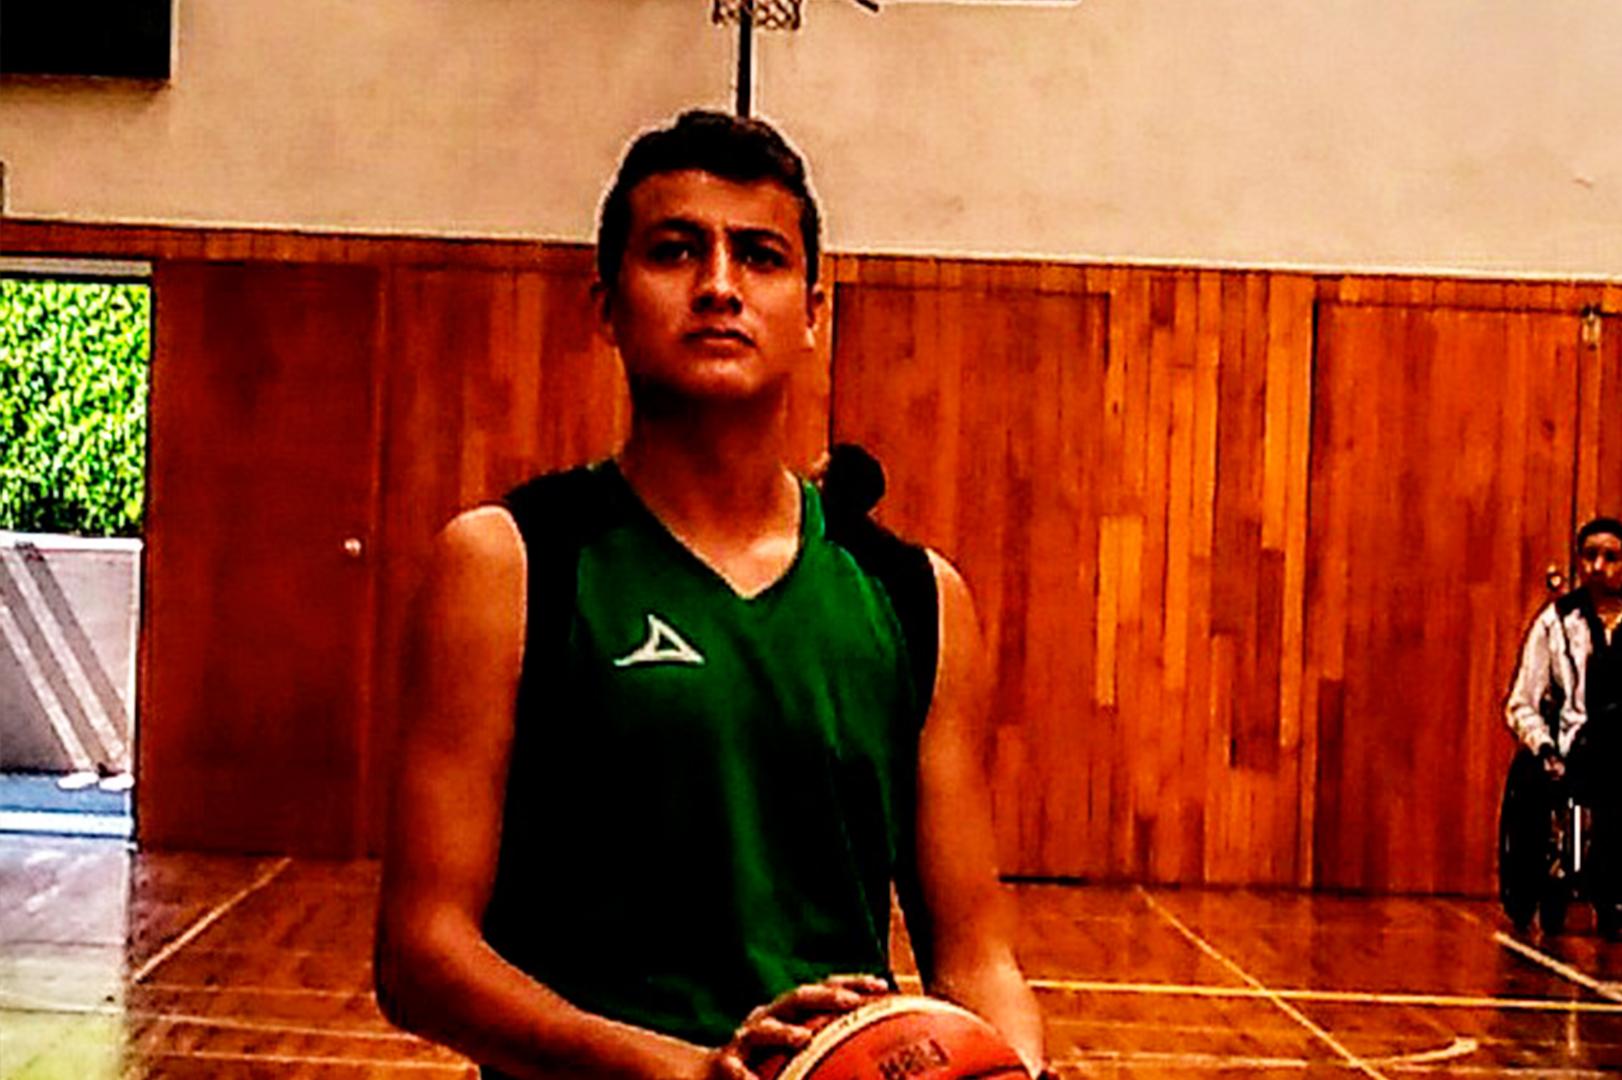 Jaime Ezequiel Mideba